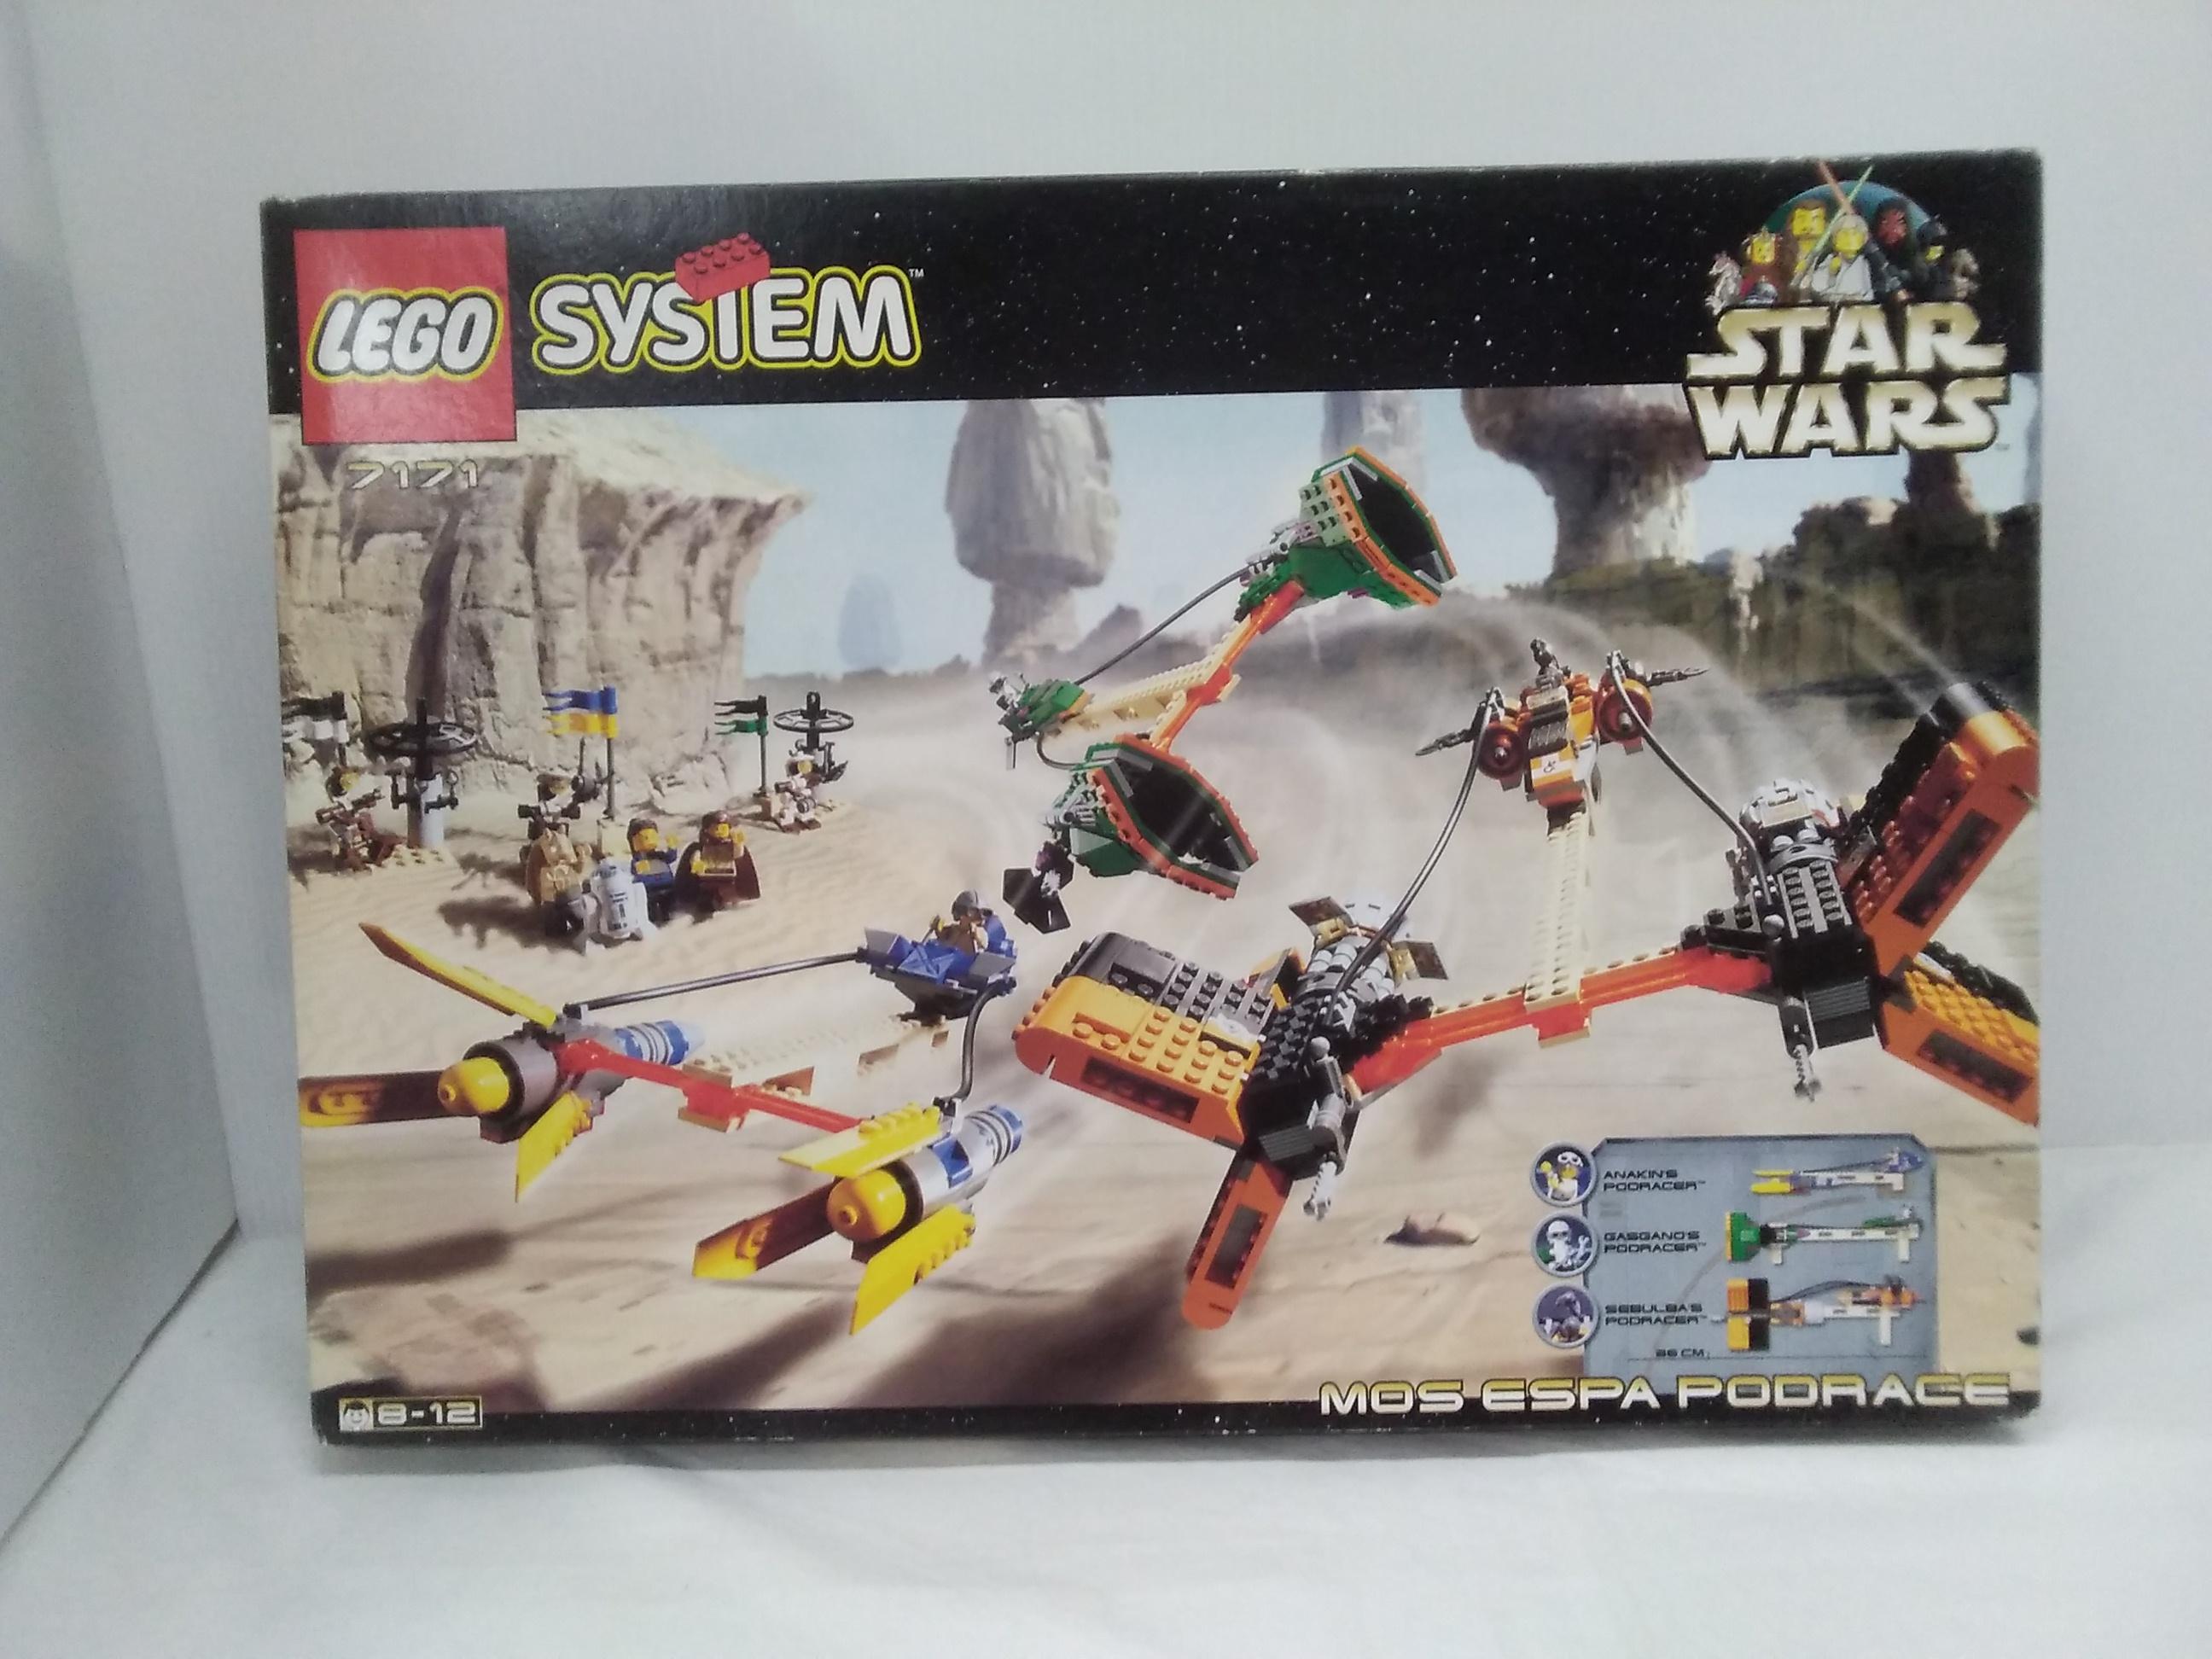 LEGO SYSTEM|LEGO